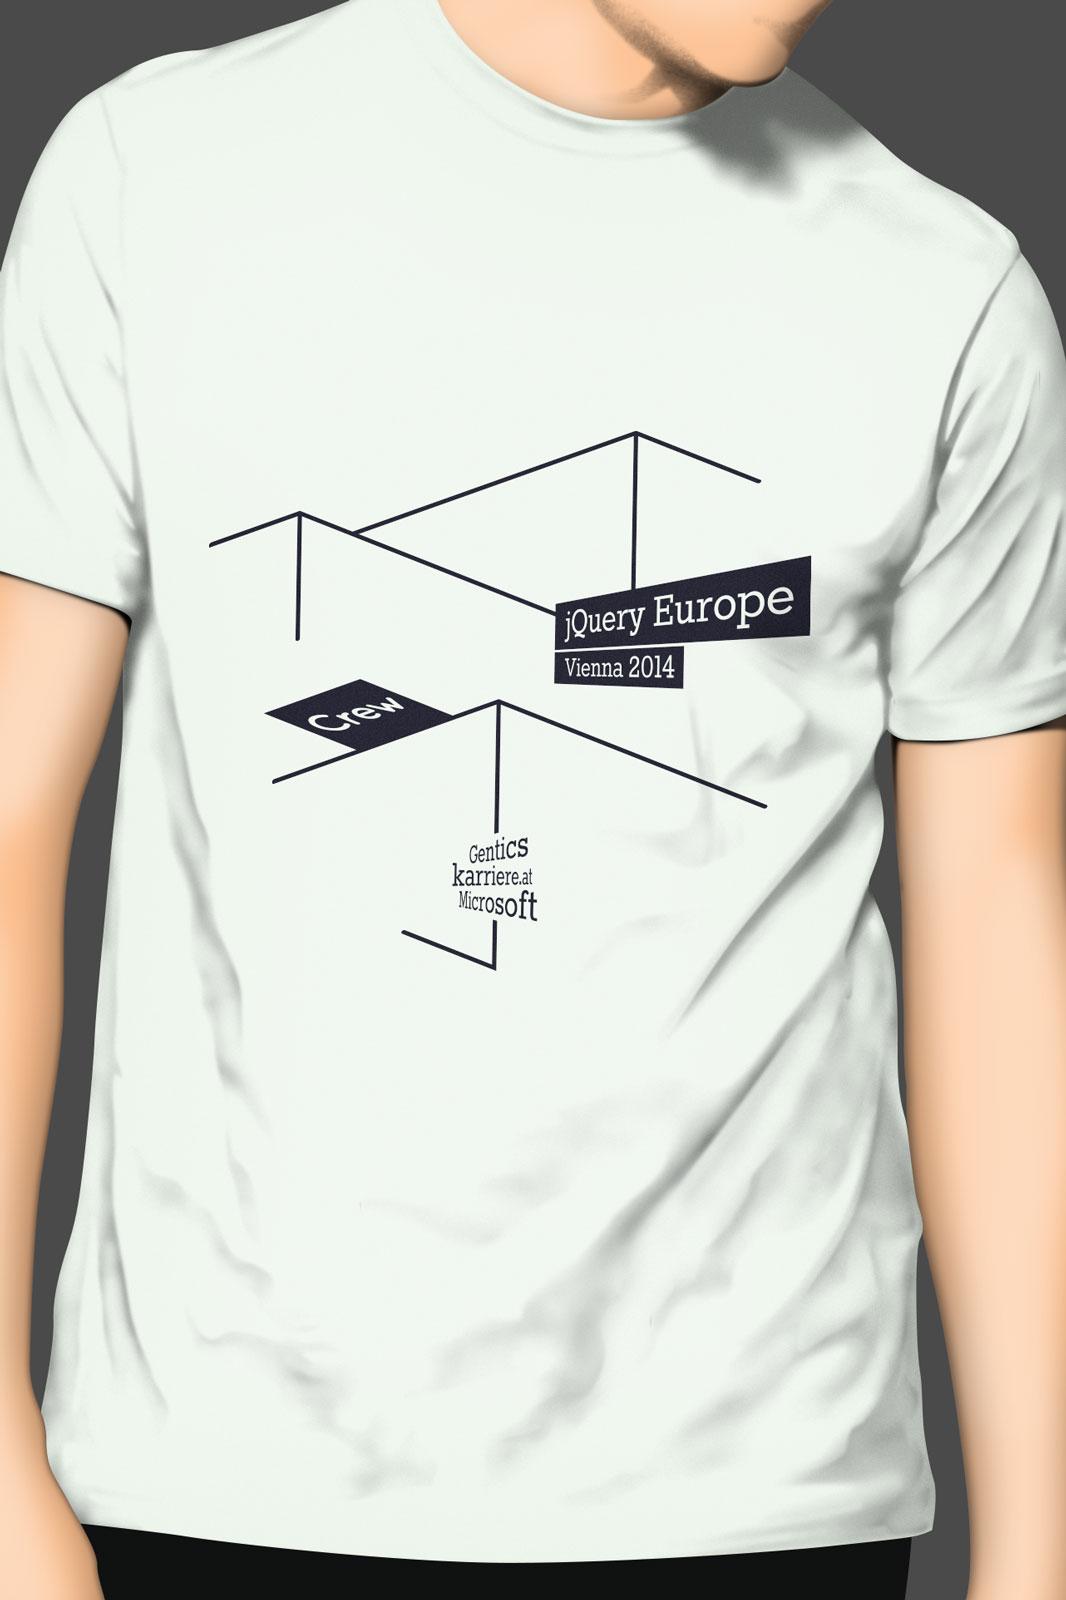 J Query Europe Shirt 1